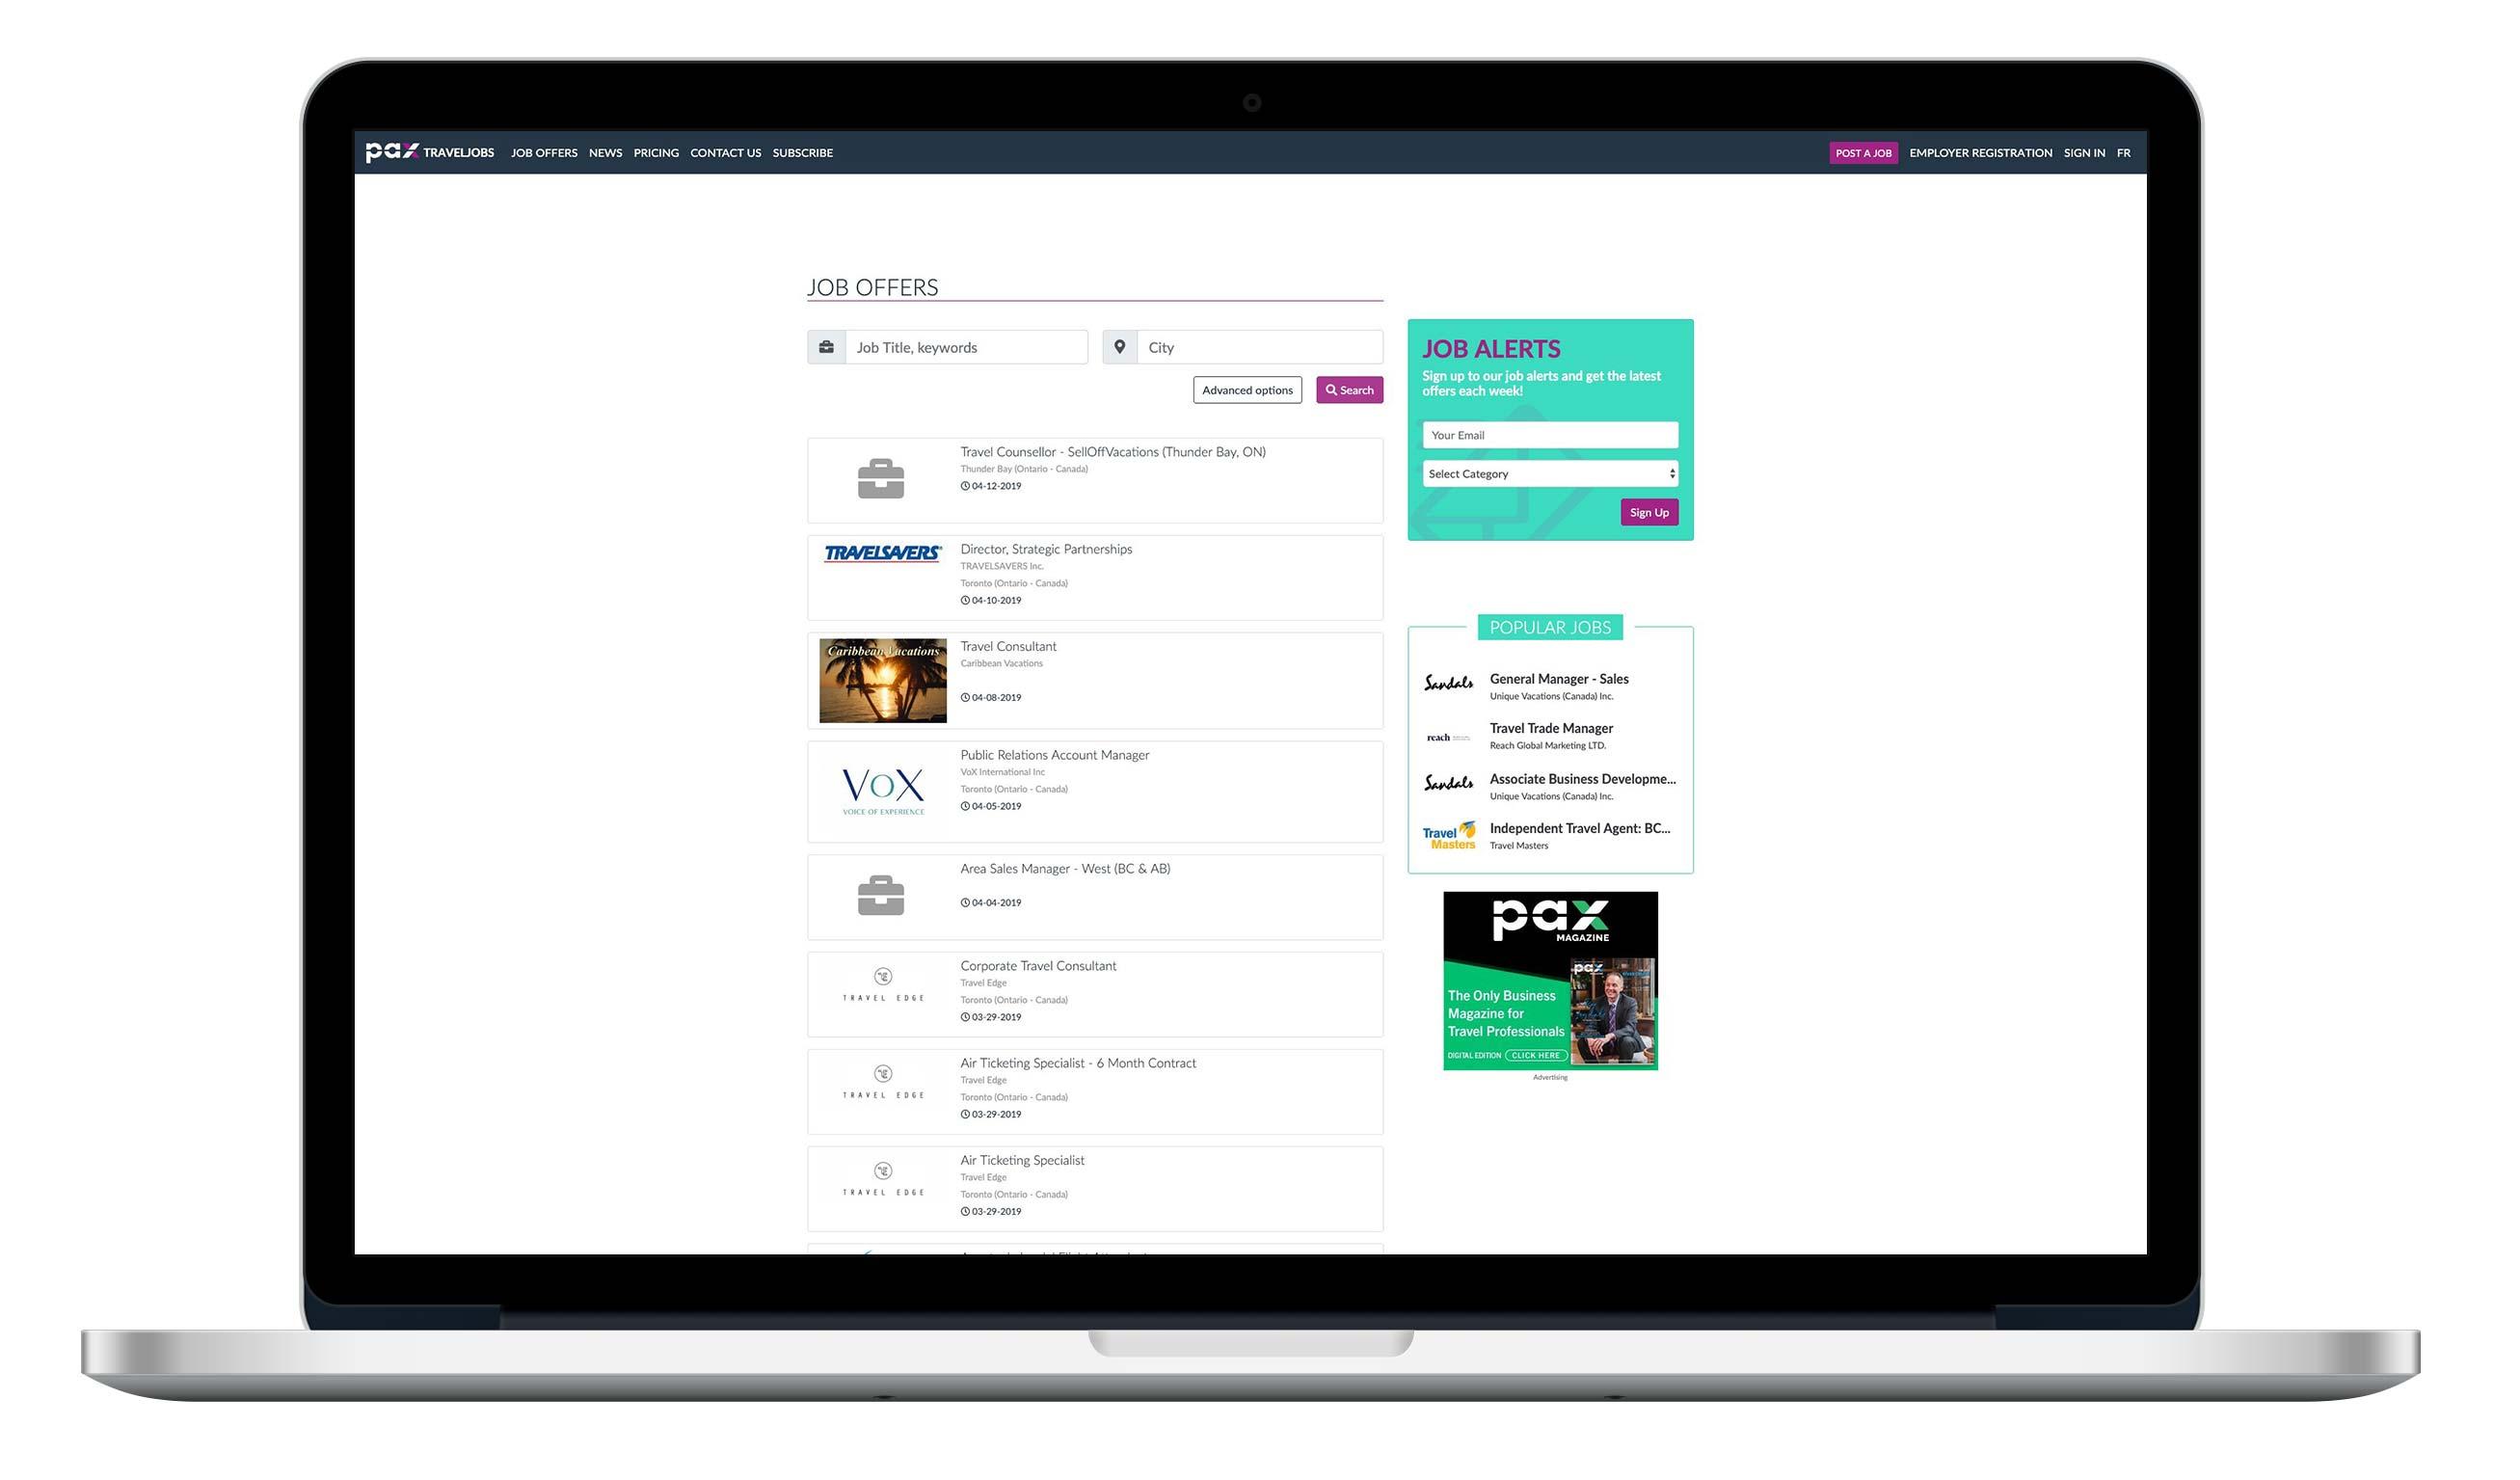 Web site interface of QuickPresse.com